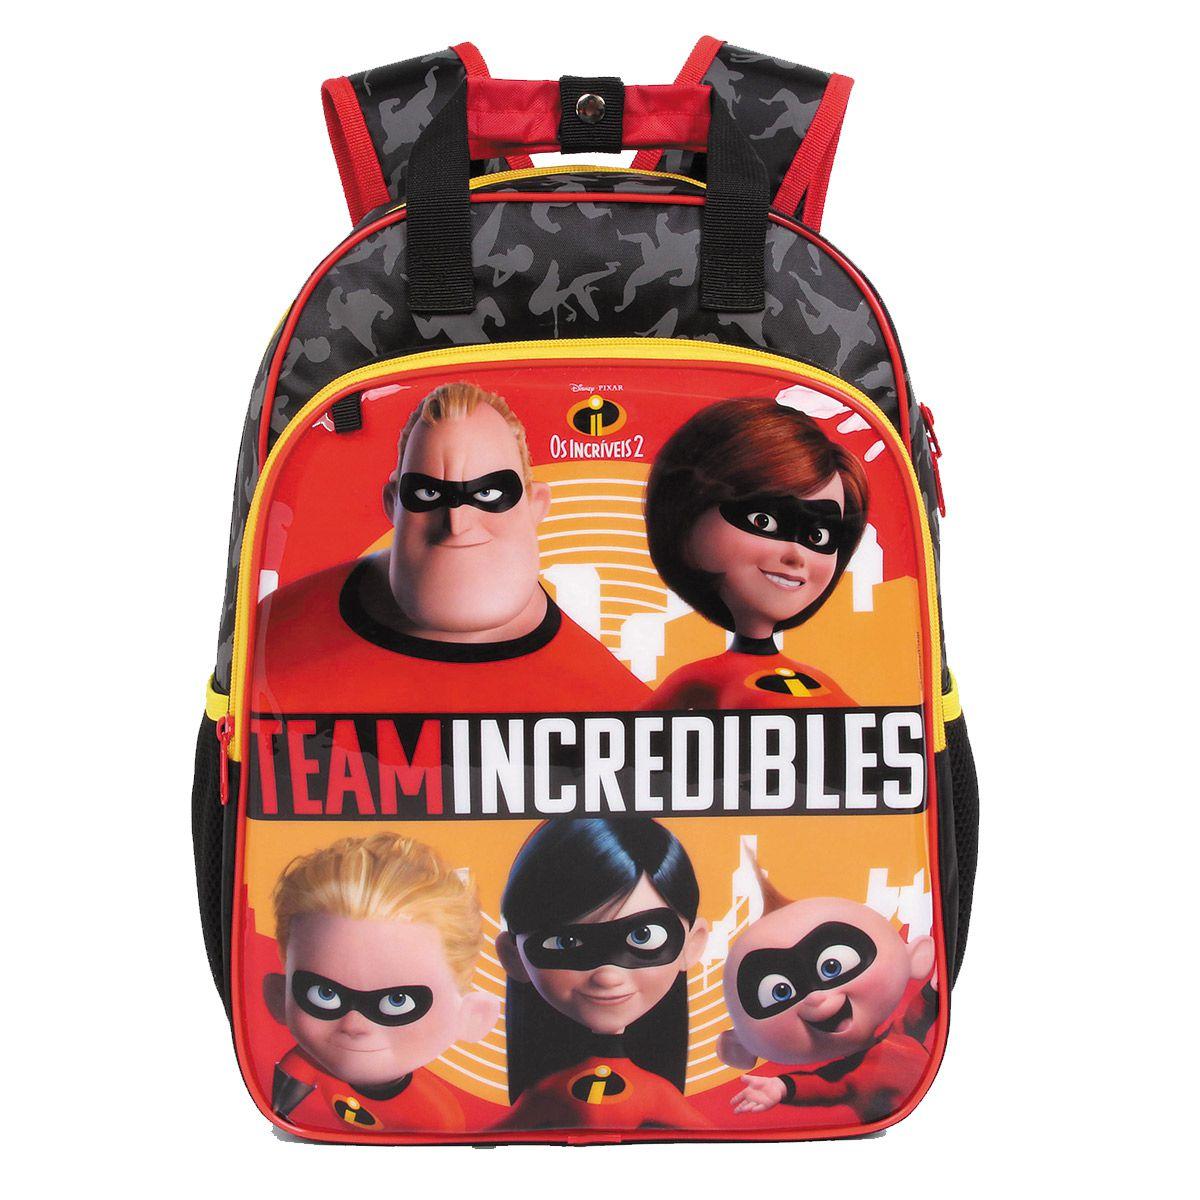 Mochila Os Incríveis 2 Oficial Team Incredibles + Estojo Disney